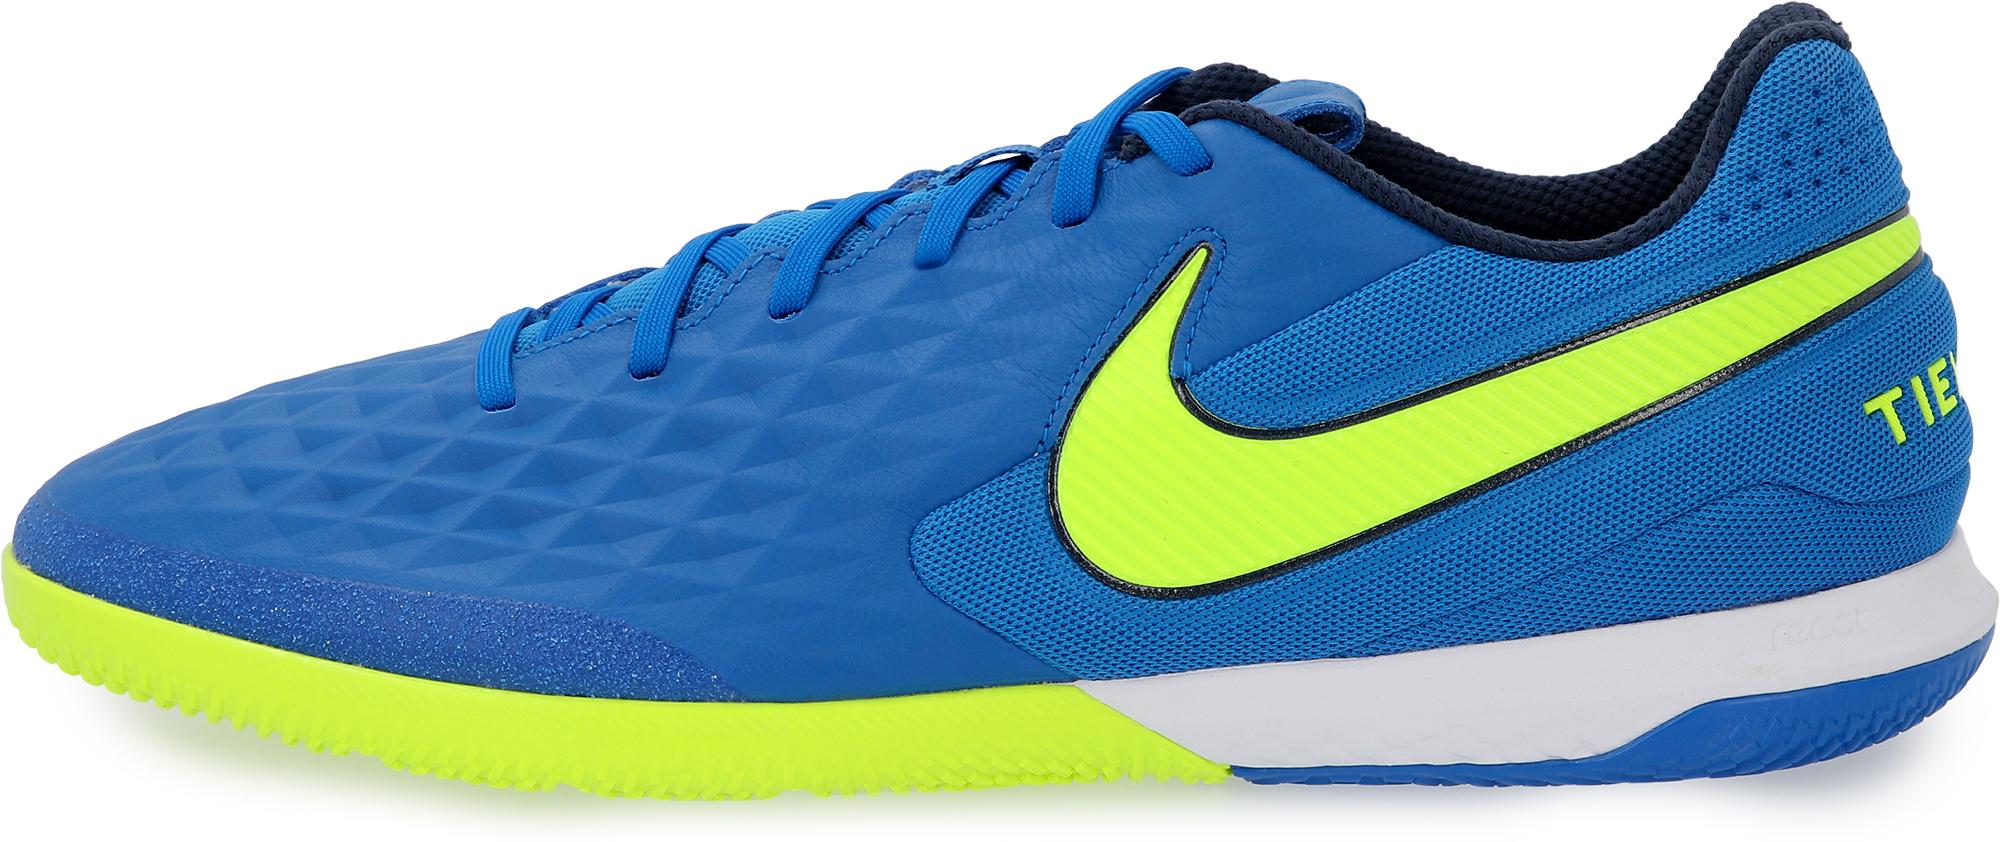 Nike Бутсы мужские Nike React Legend 8 Pro Ic, размер 41.5 бутсы мужские nike legend 8 club ic размер 41